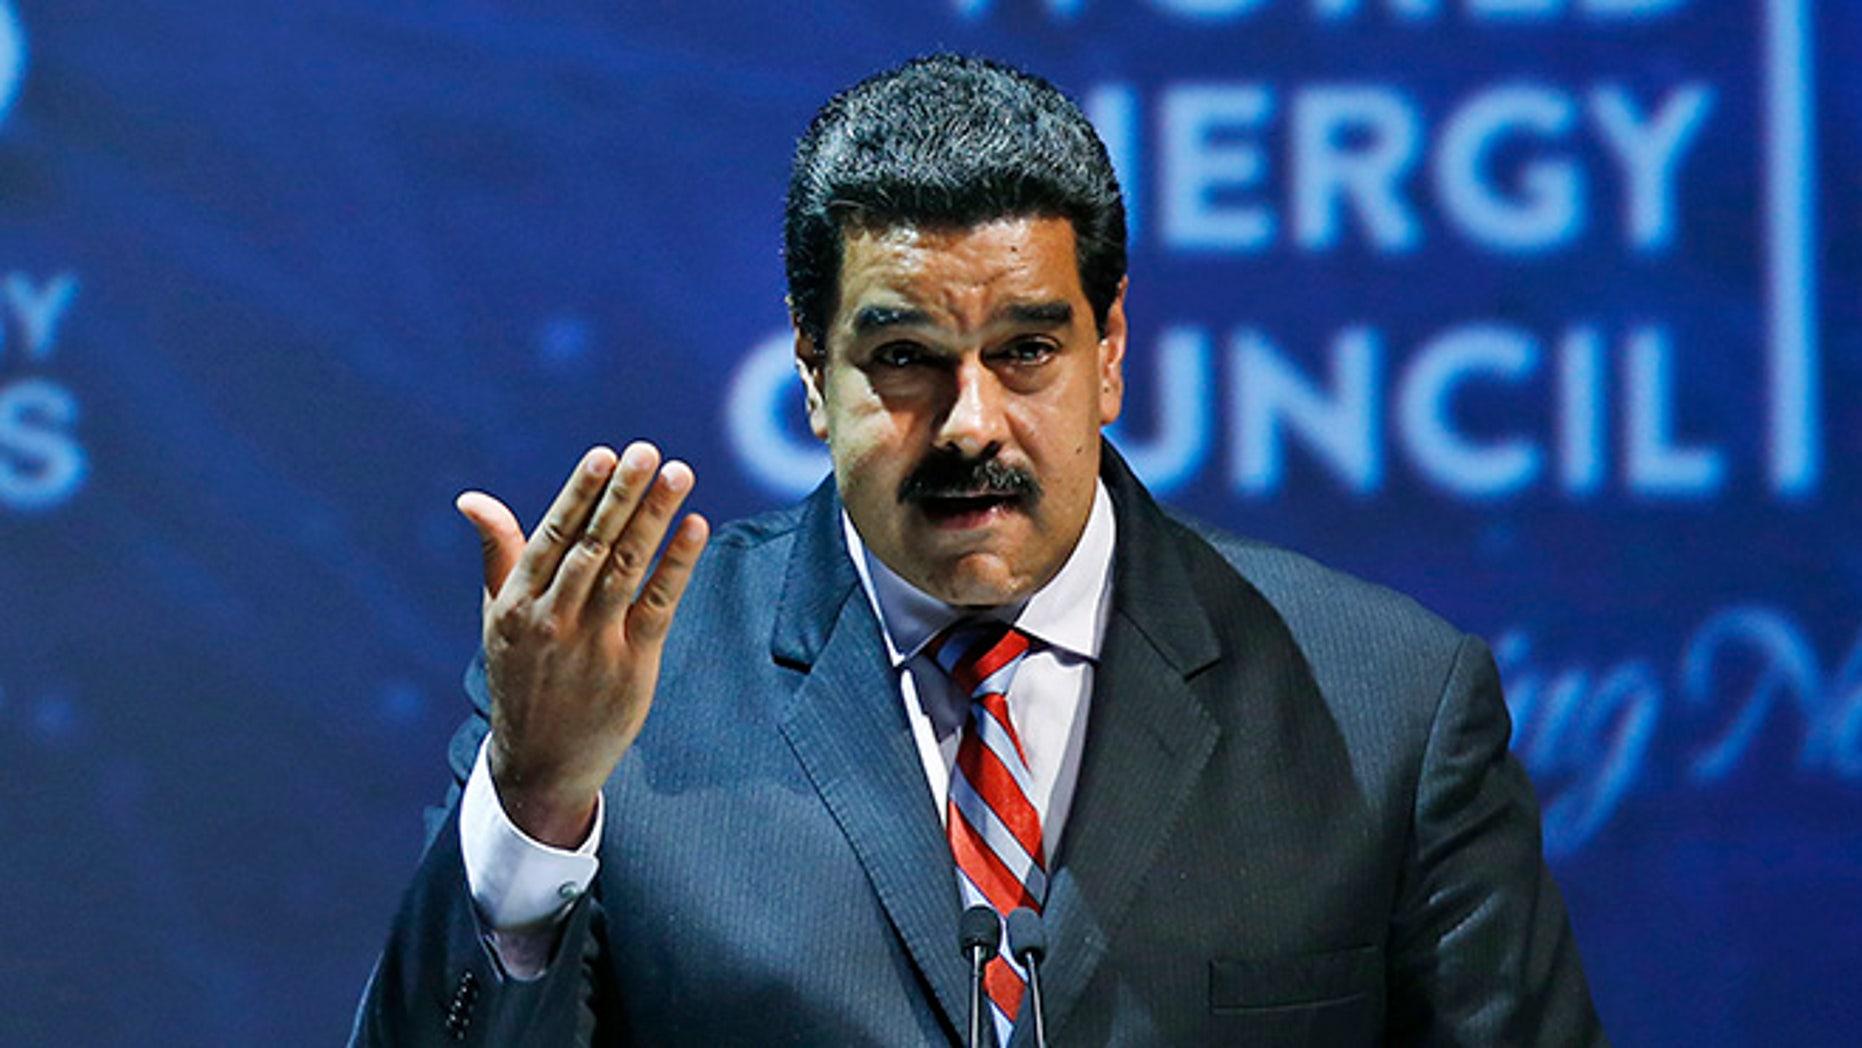 Venezuela's President Nicolas Maduro at the World Energy Congress, in Istanbul, Oct. 10, 2016.